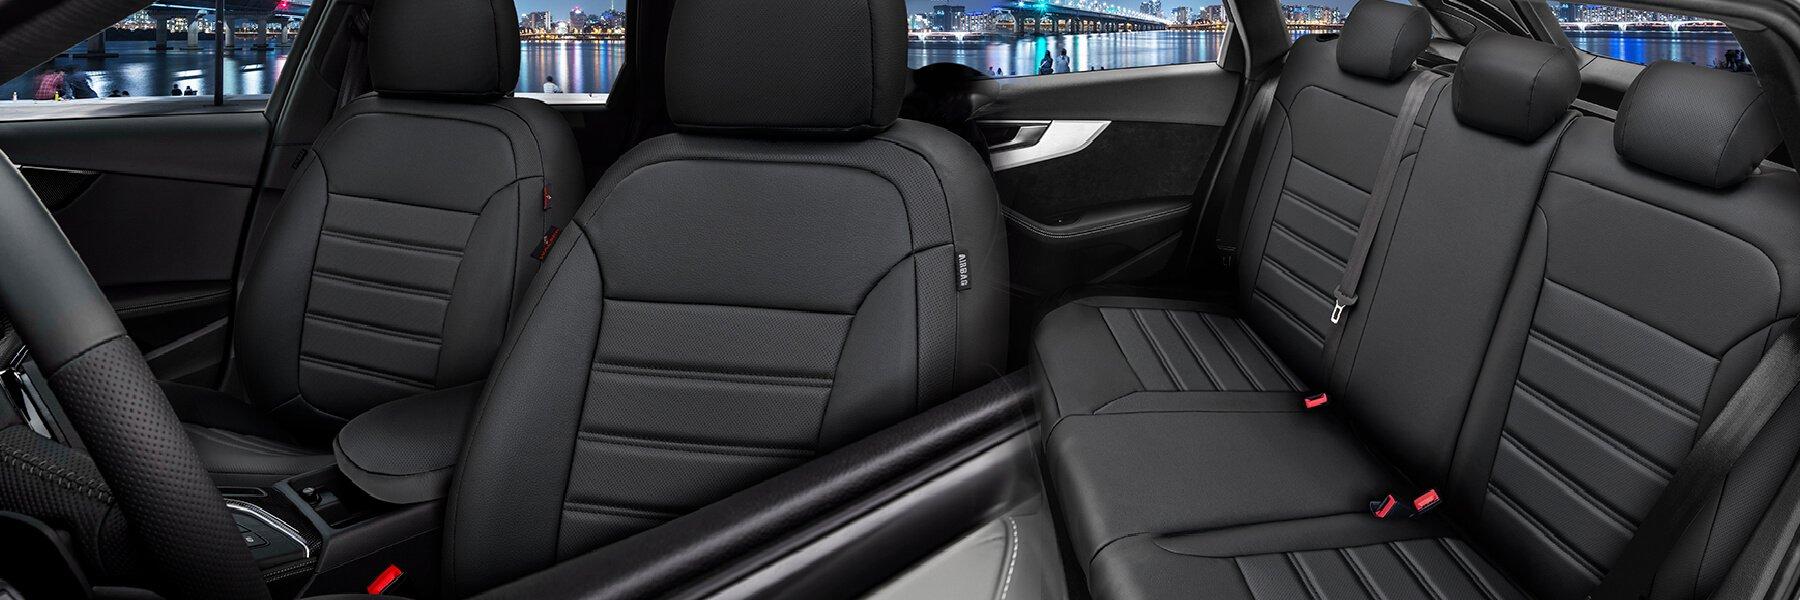 Mitsubishi Pajero Schonbezüge Sitzbezug  Sitzbezüge Fahrer /& Beifahrer 02